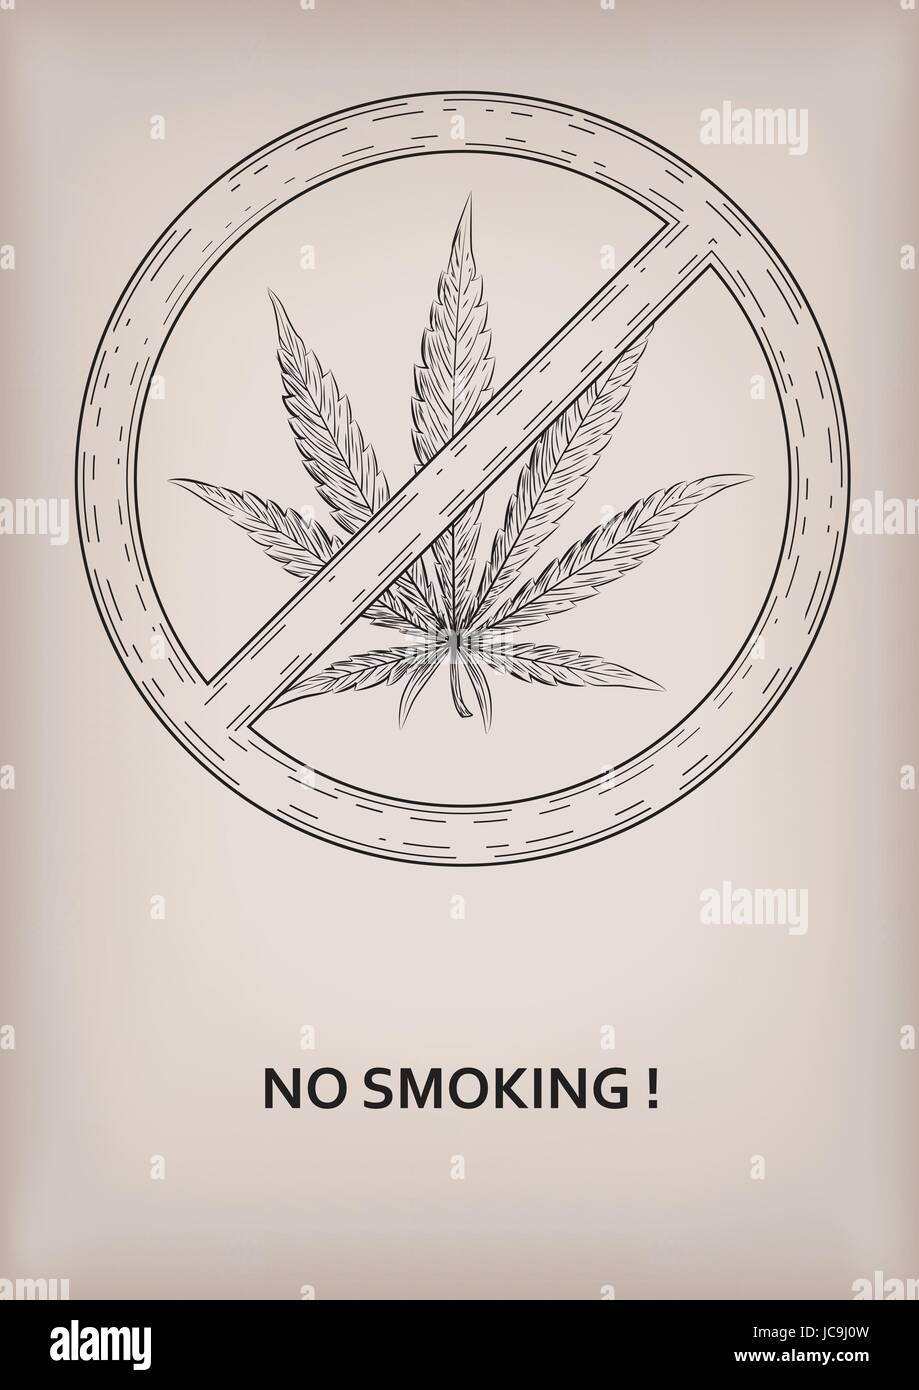 Cannabis-Raucher datieren